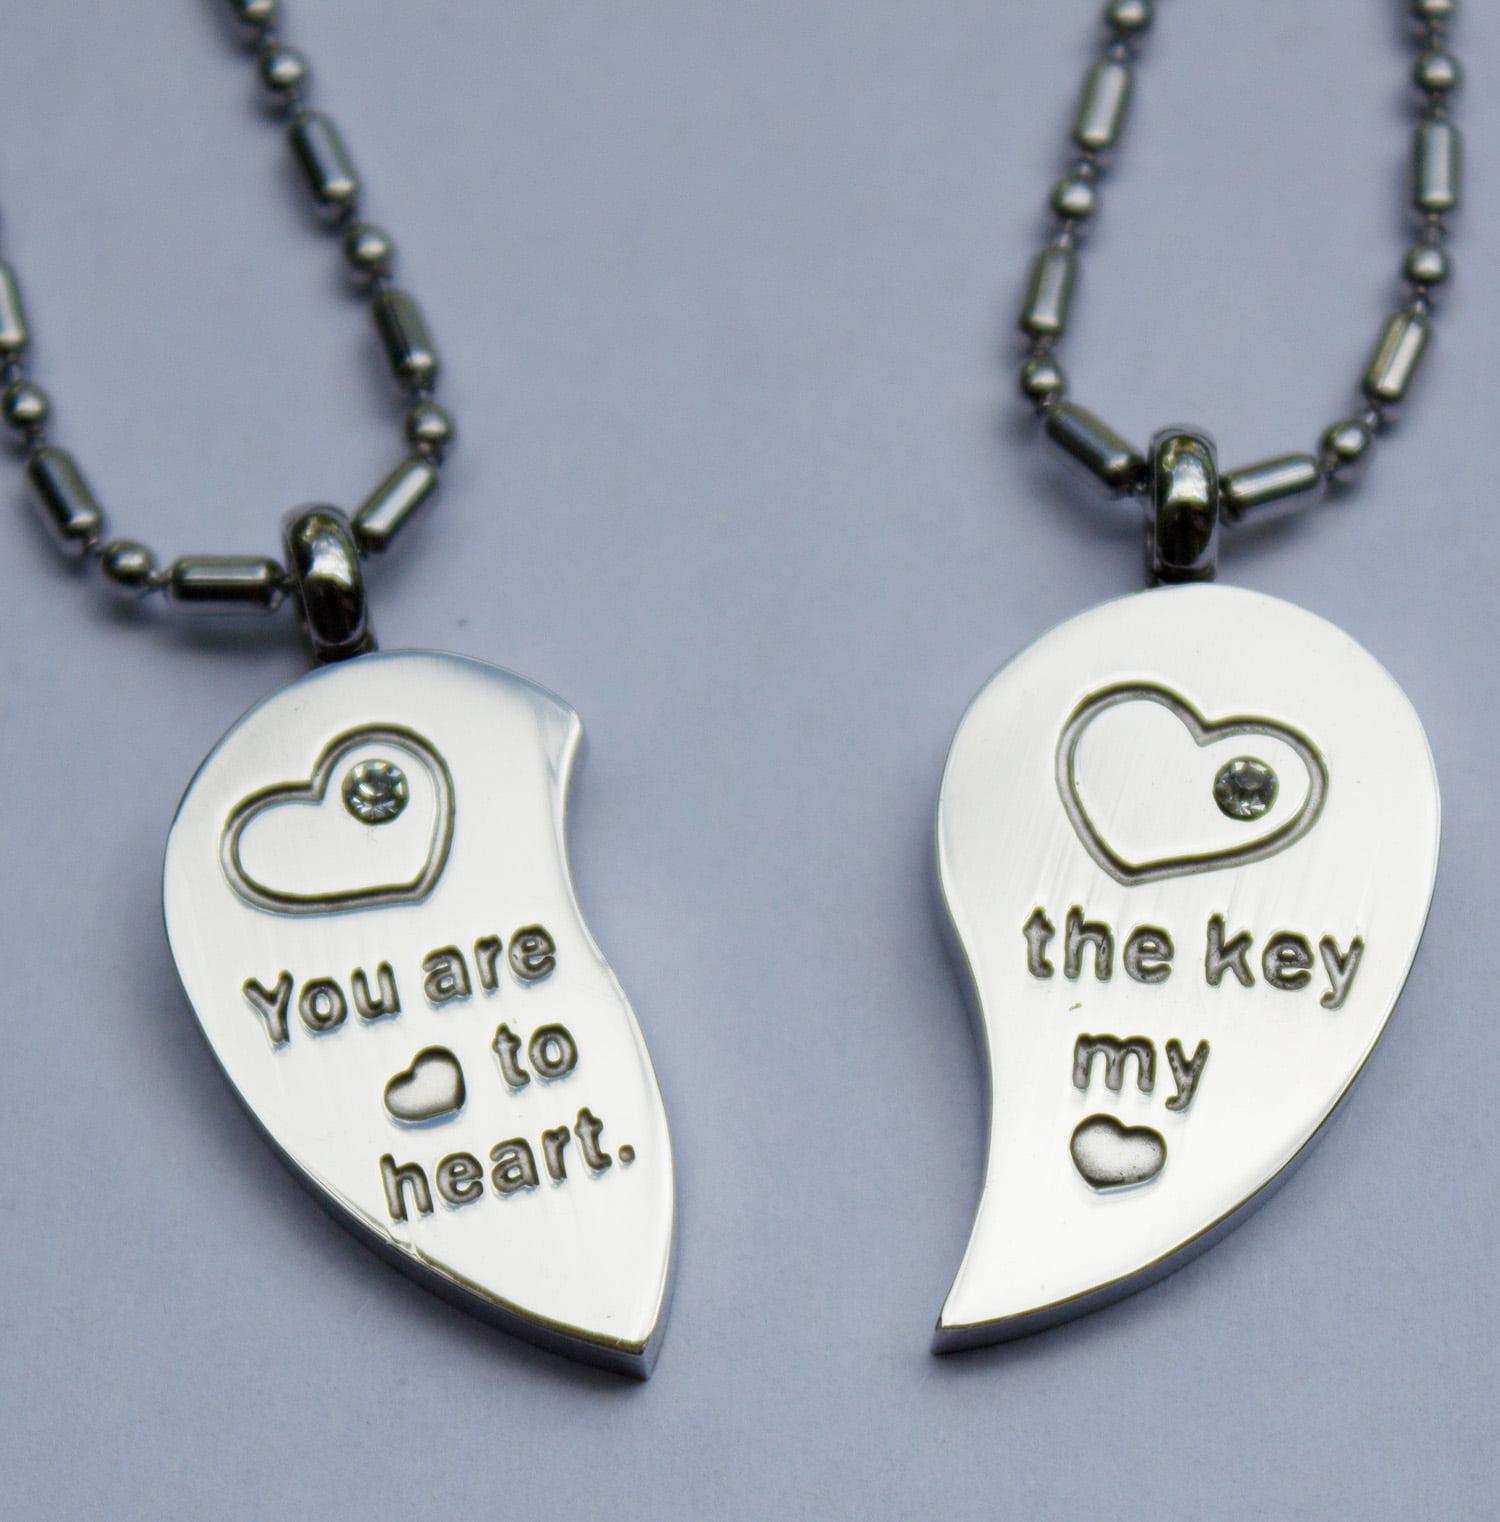 Love Jewelry Love Necklace Couple Locket Love Locket Couple Jewelry Art jewelry by Cut the Fish Jewelry Love Couple